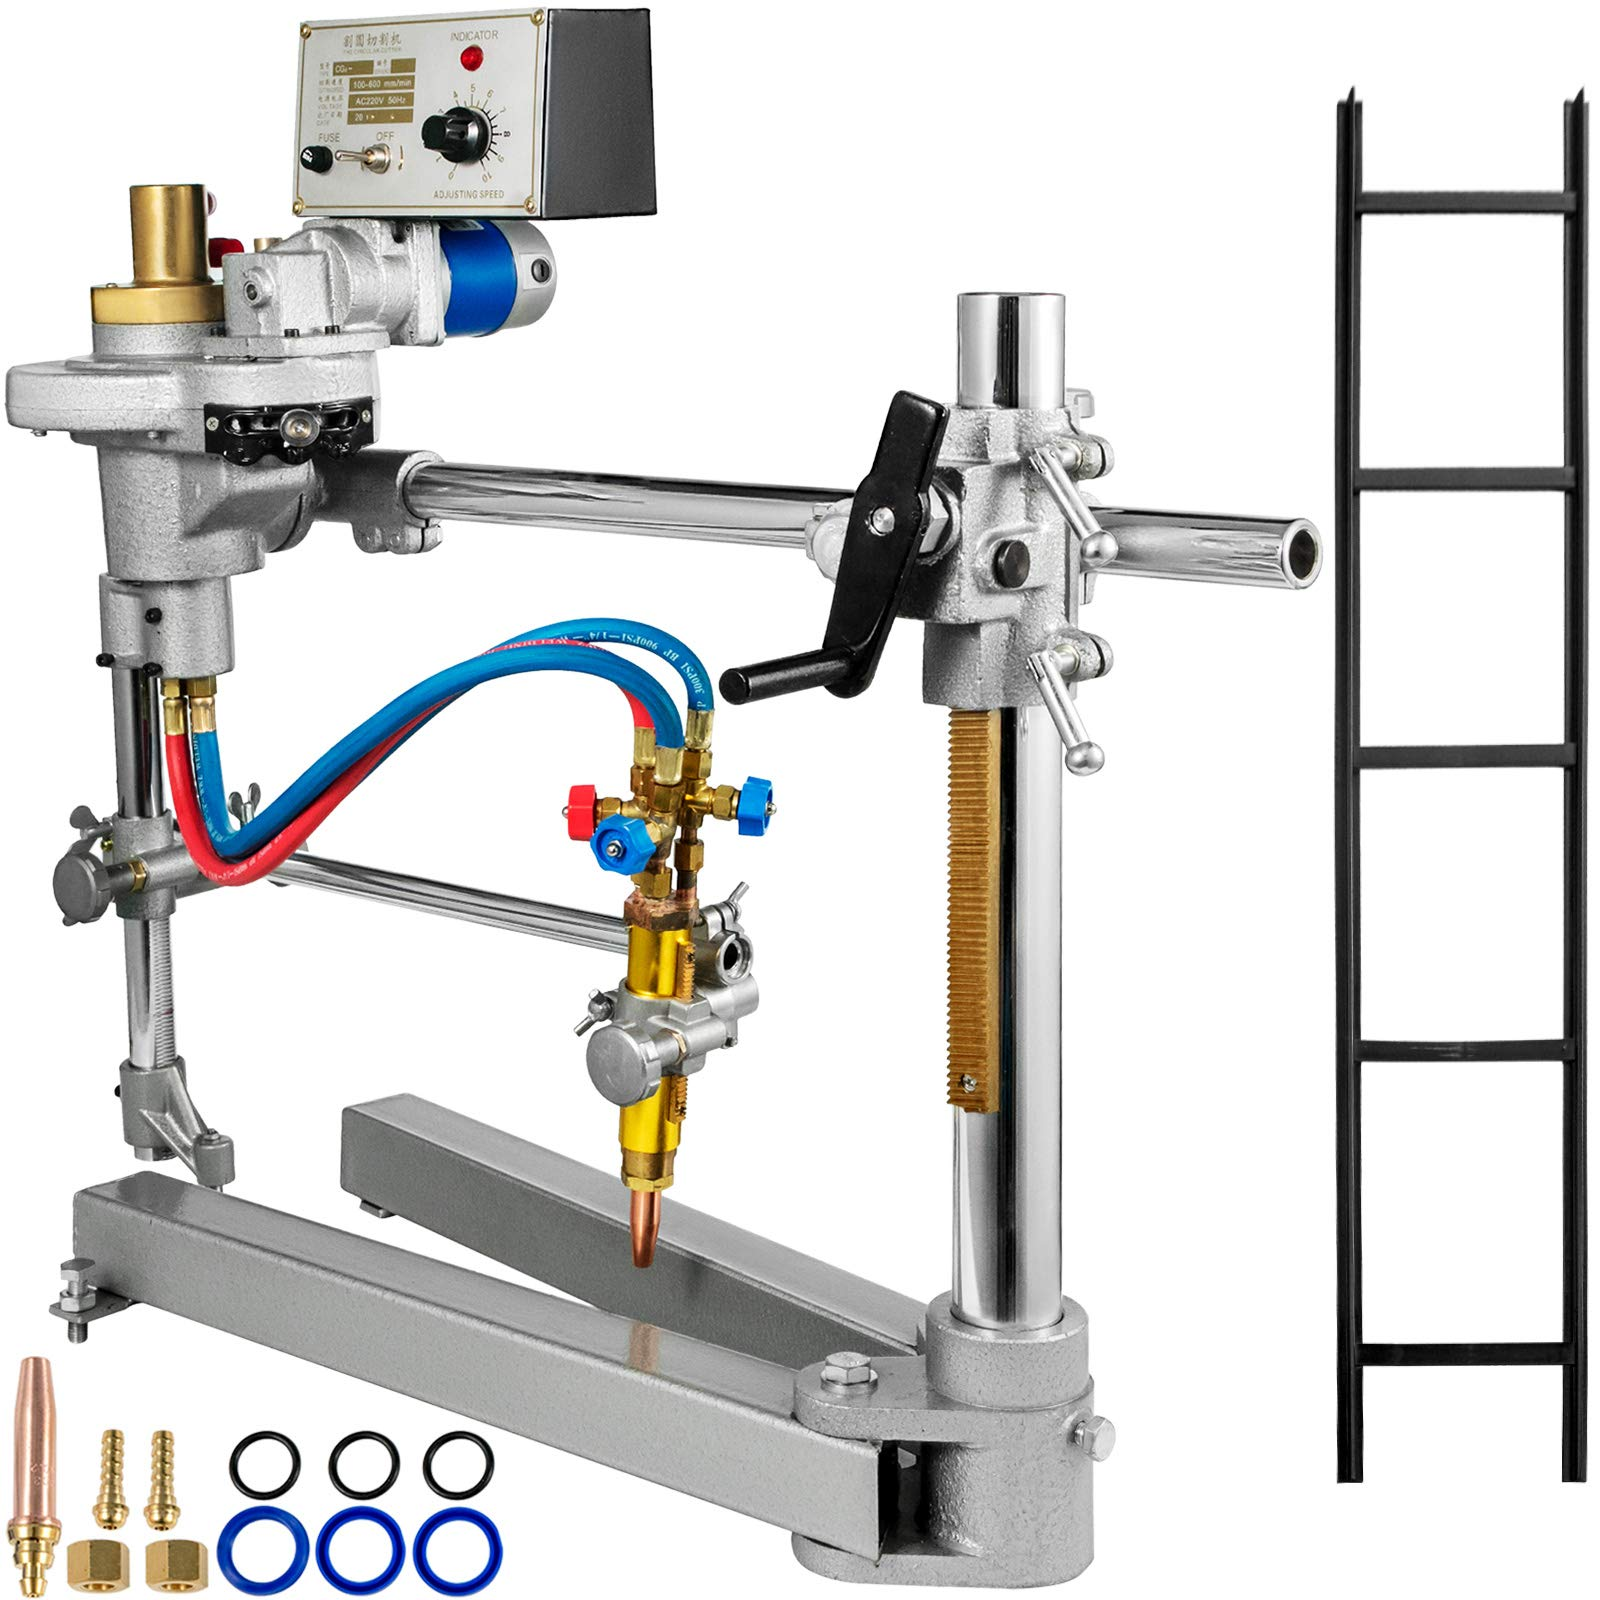 "Mophorn CG2-600 110V Round Semi-Automatic Cutting Machine 1.1-23.6""(30-600mm) Cutting Diameter Track Torch Portable Track Burner Gas Cutting Machine Professional Flame Cutting Machine Metal Cutting"